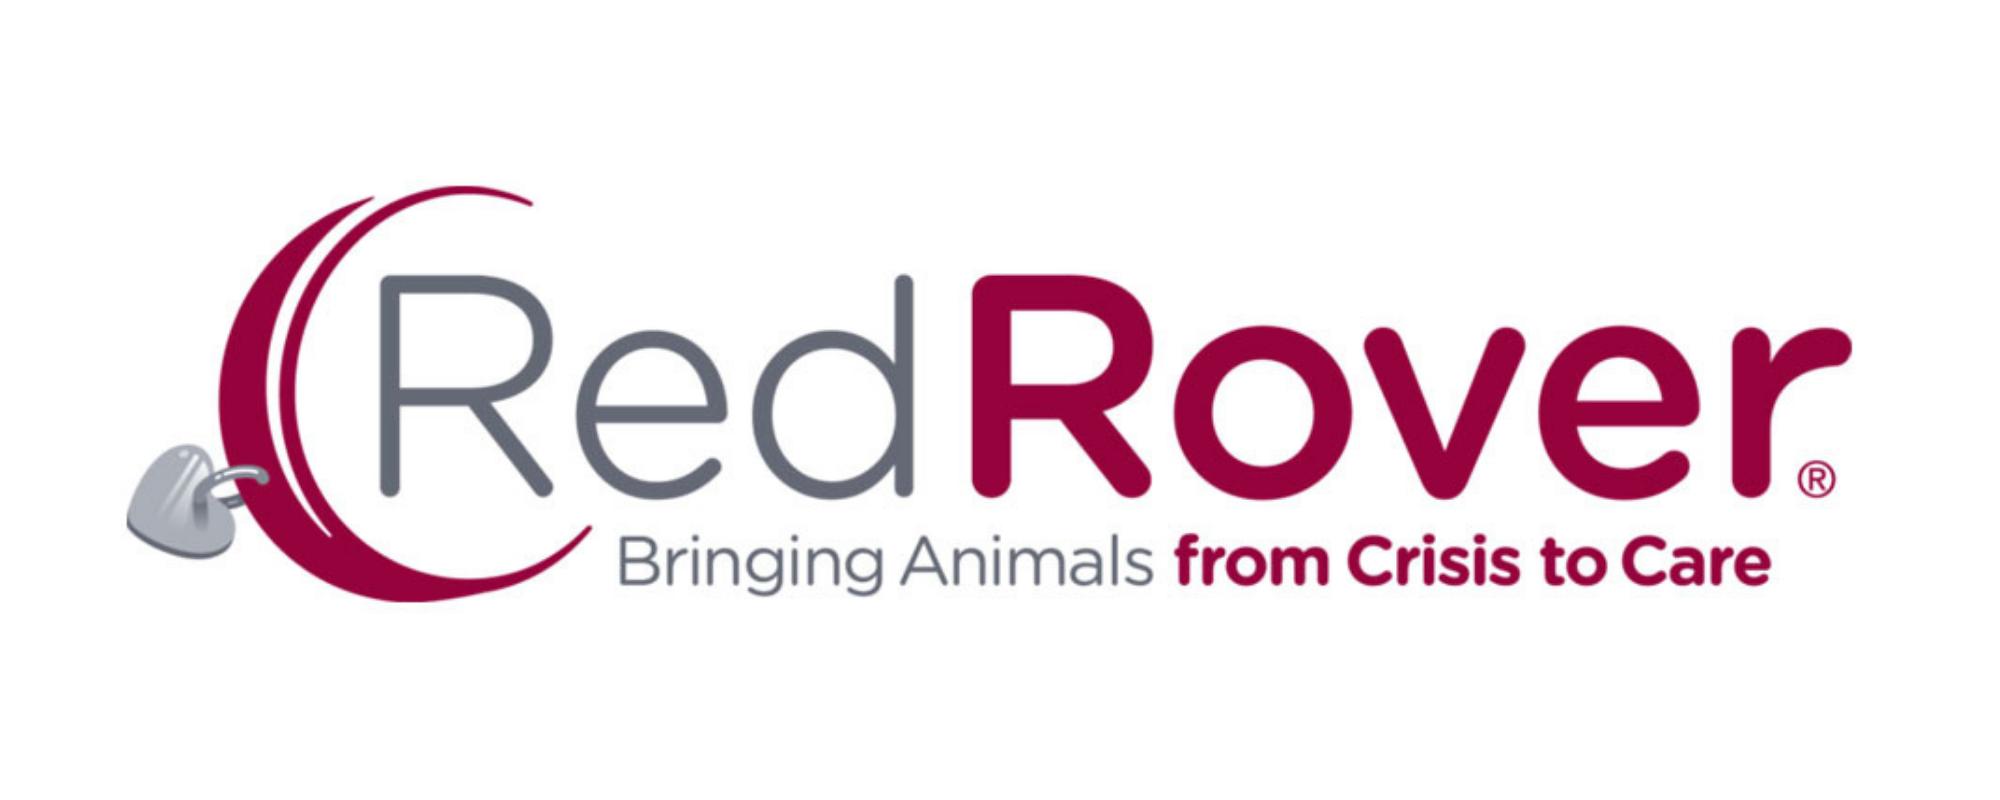 Redrover Resized 1